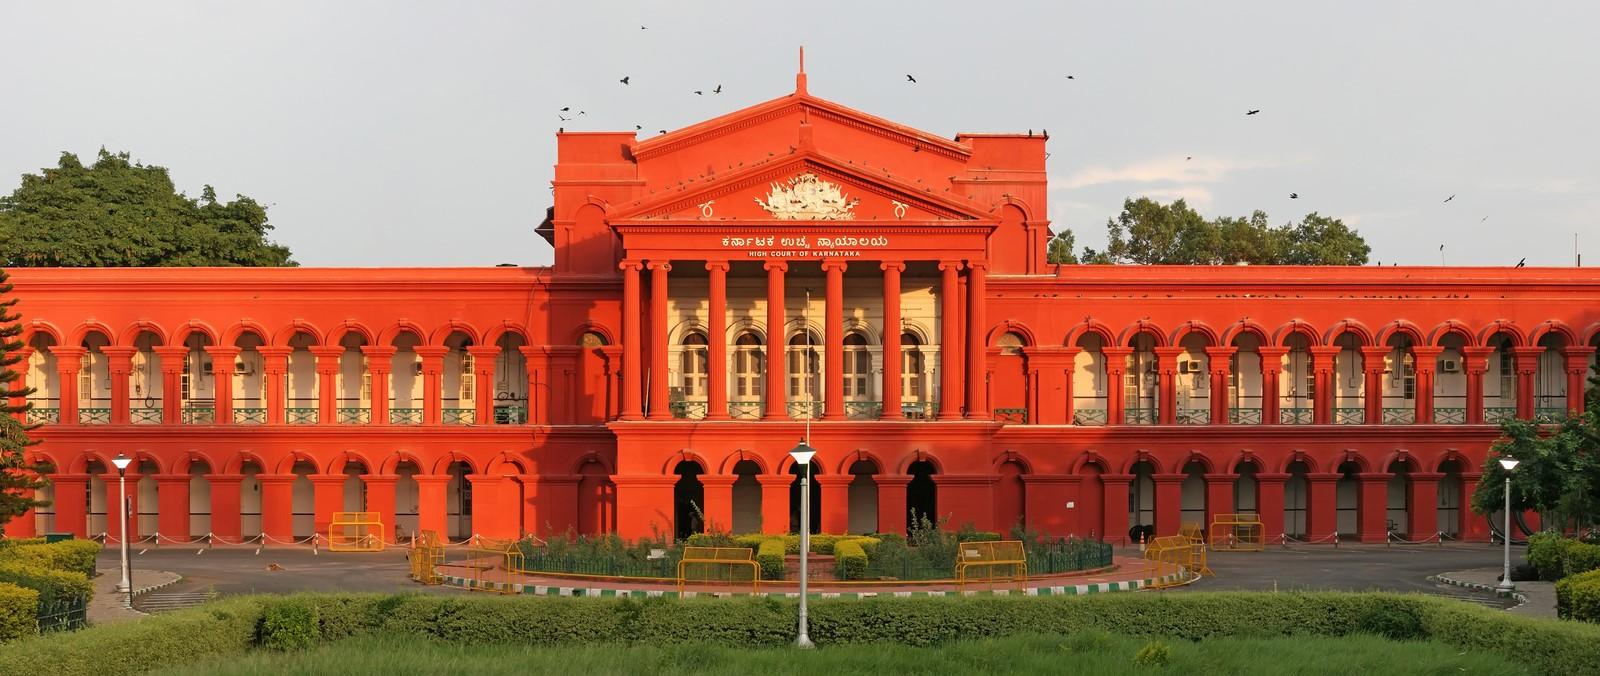 Bangalore Highcourt - Sheet1